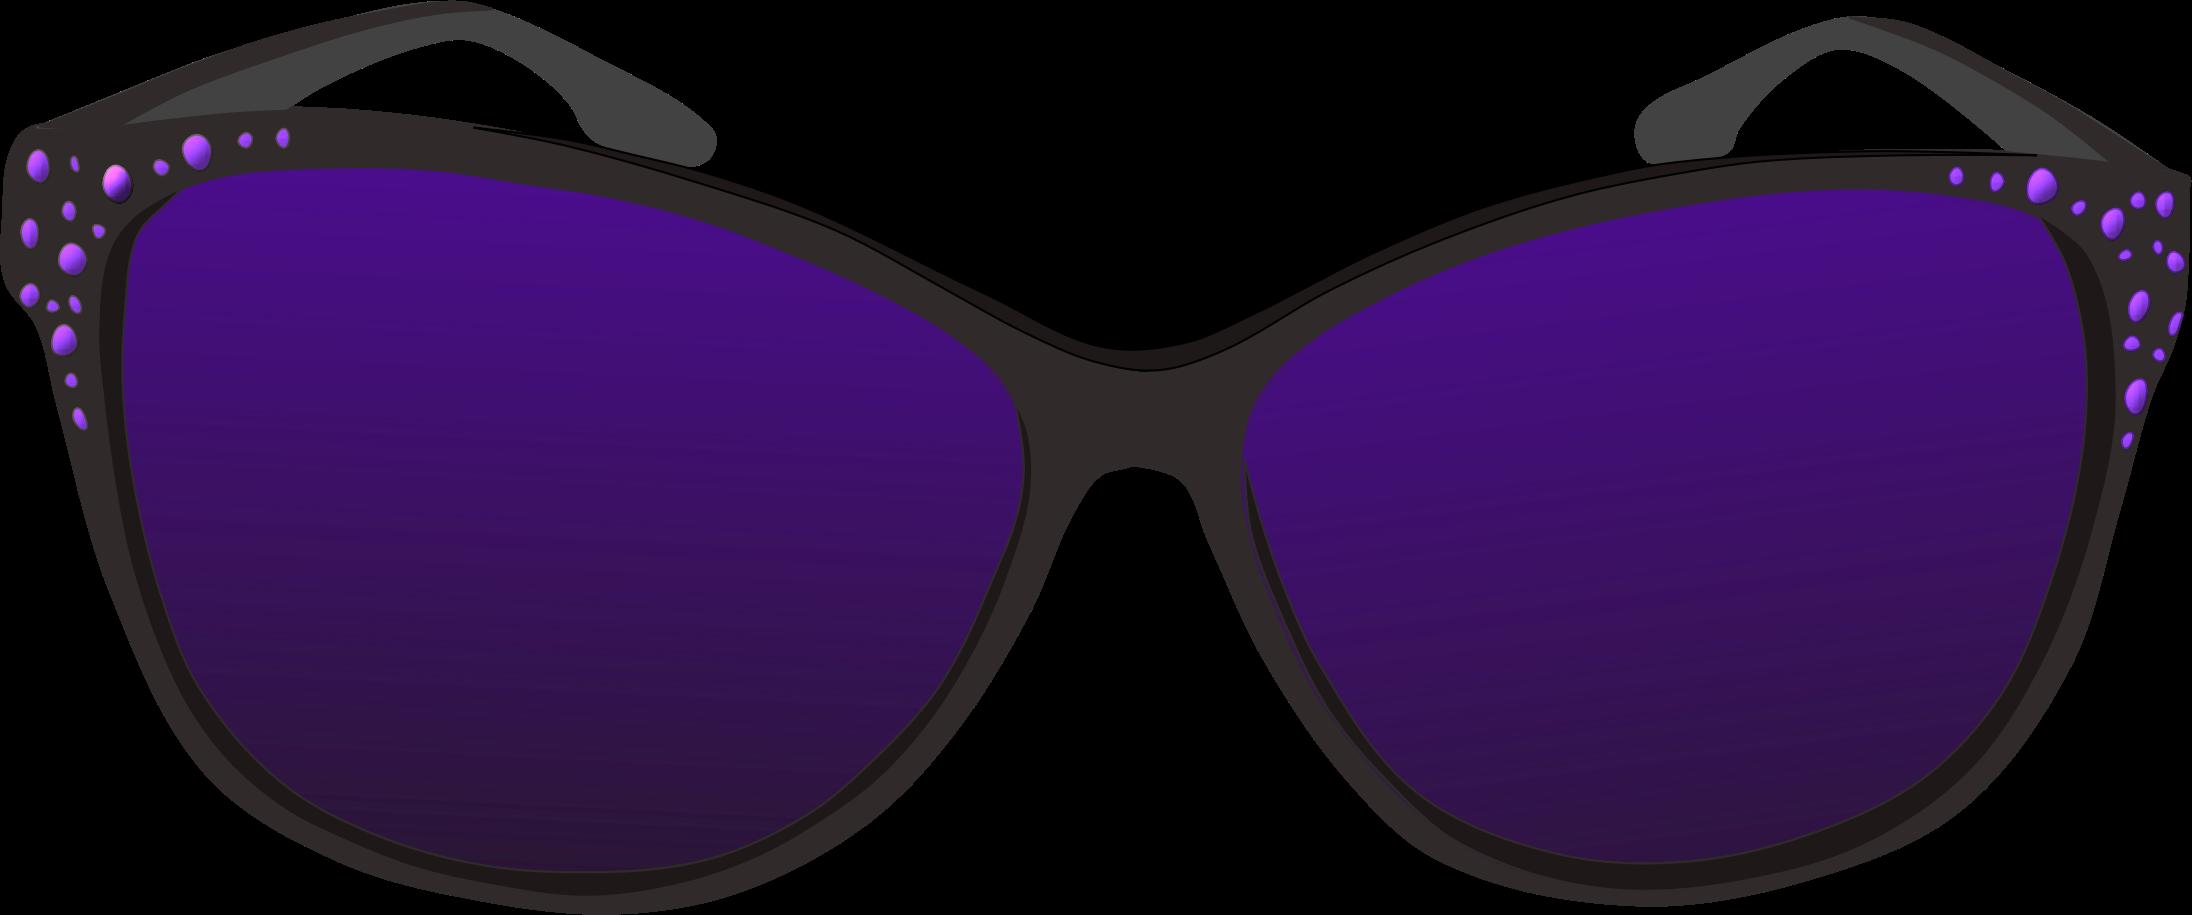 Clip art images onclipart. Clipart sunglasses kid